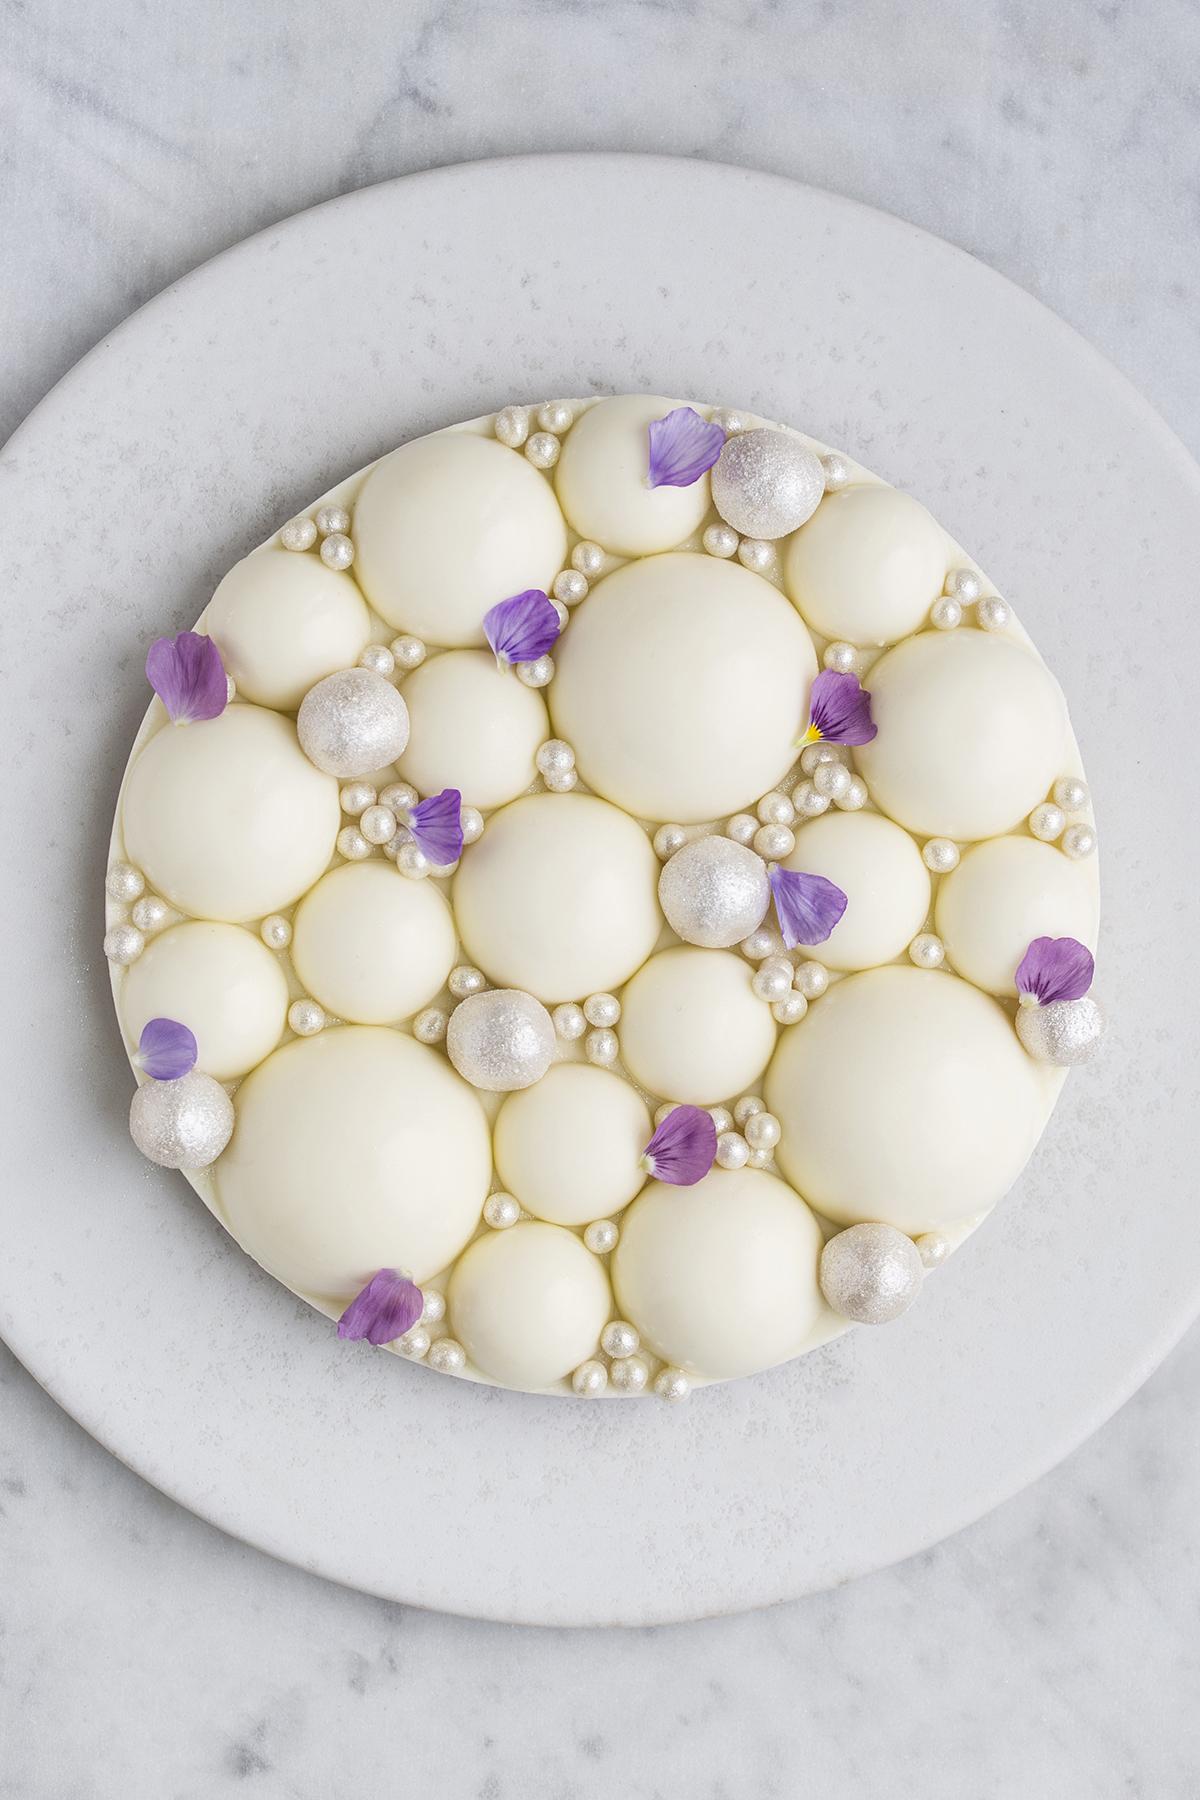 citronmoussekage med hvid chokolade og lakrids